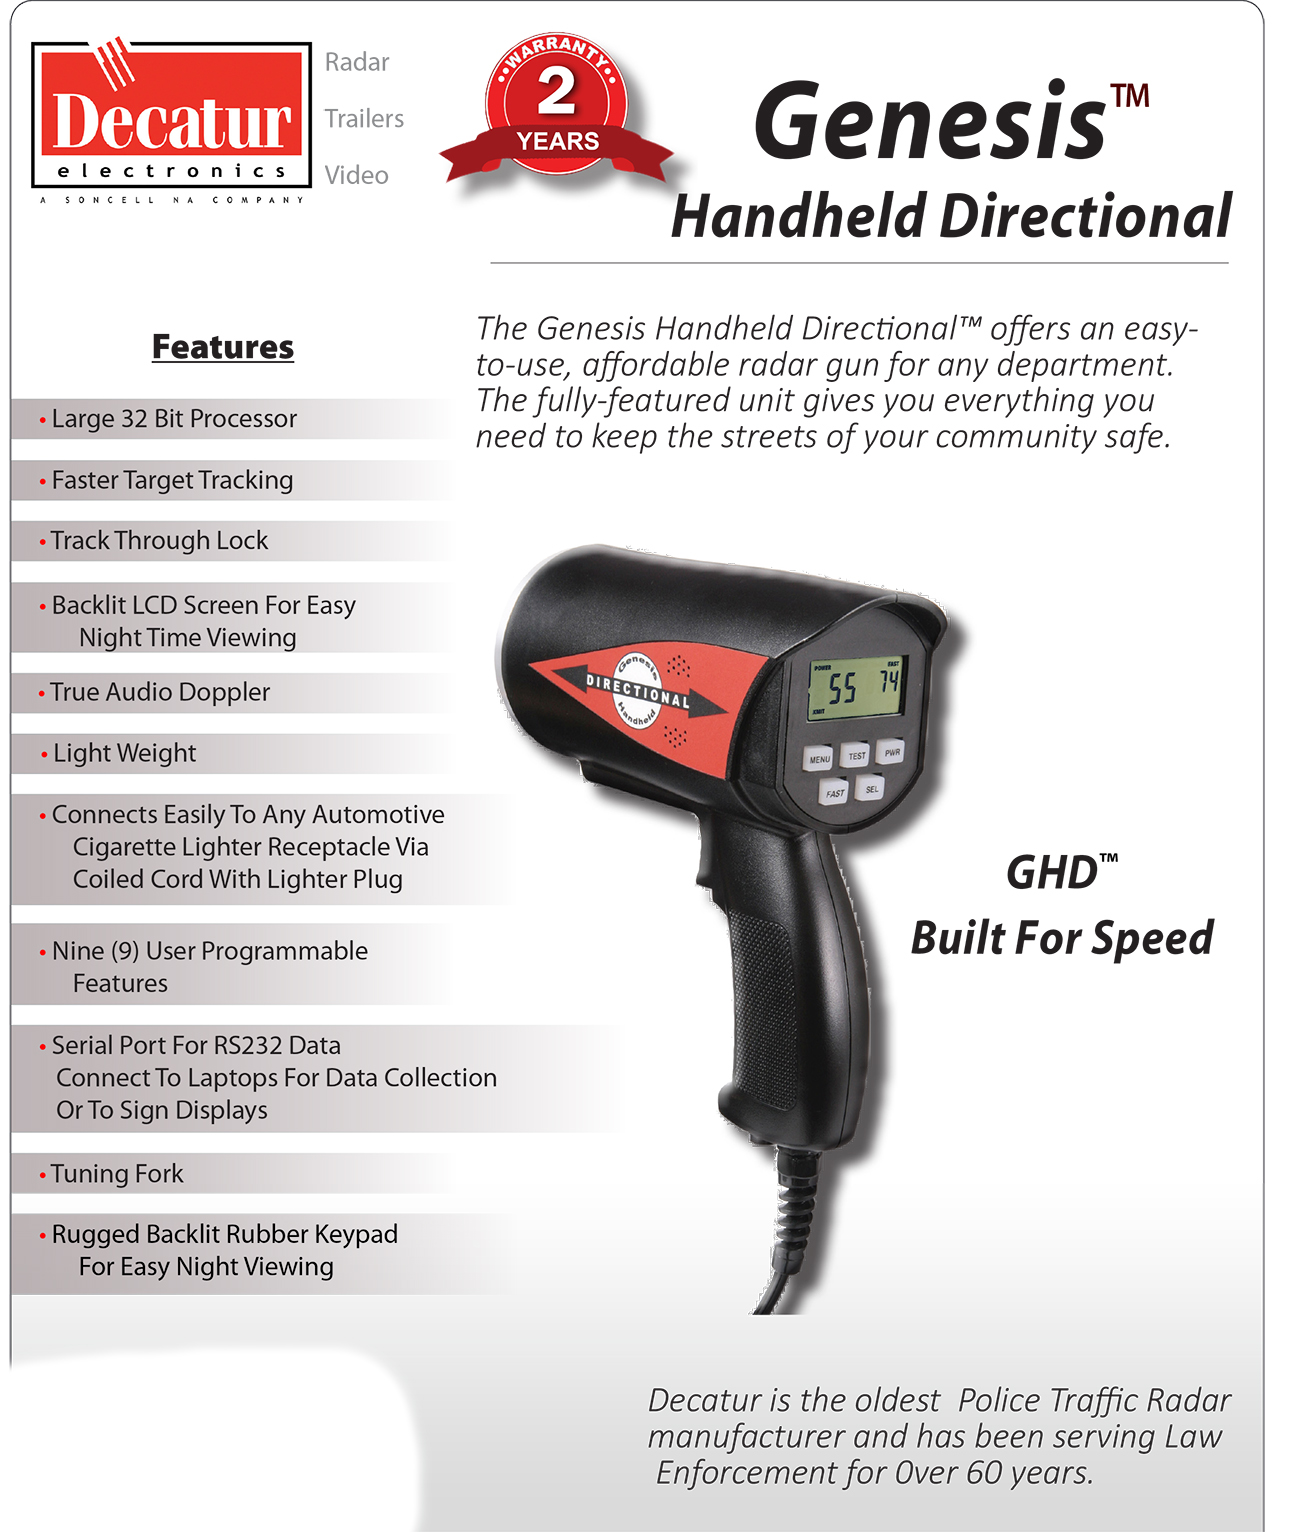 Decatur Police Traffic Radar Gun GHD Genesis Handheld